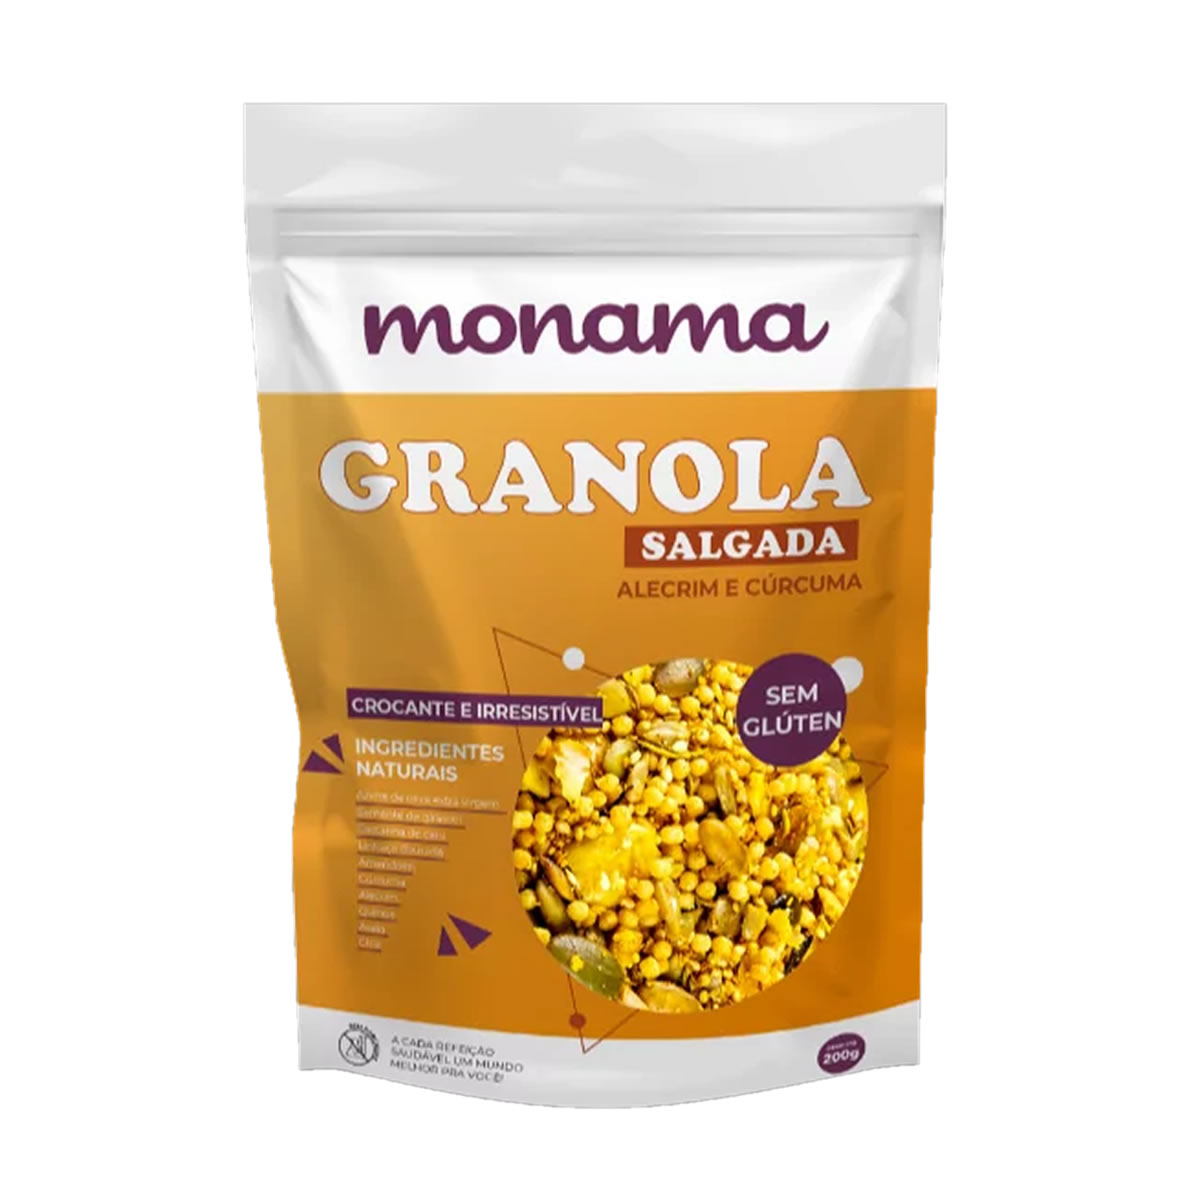 Granola Salgada Alecrim e Curcuma 200g - Monama